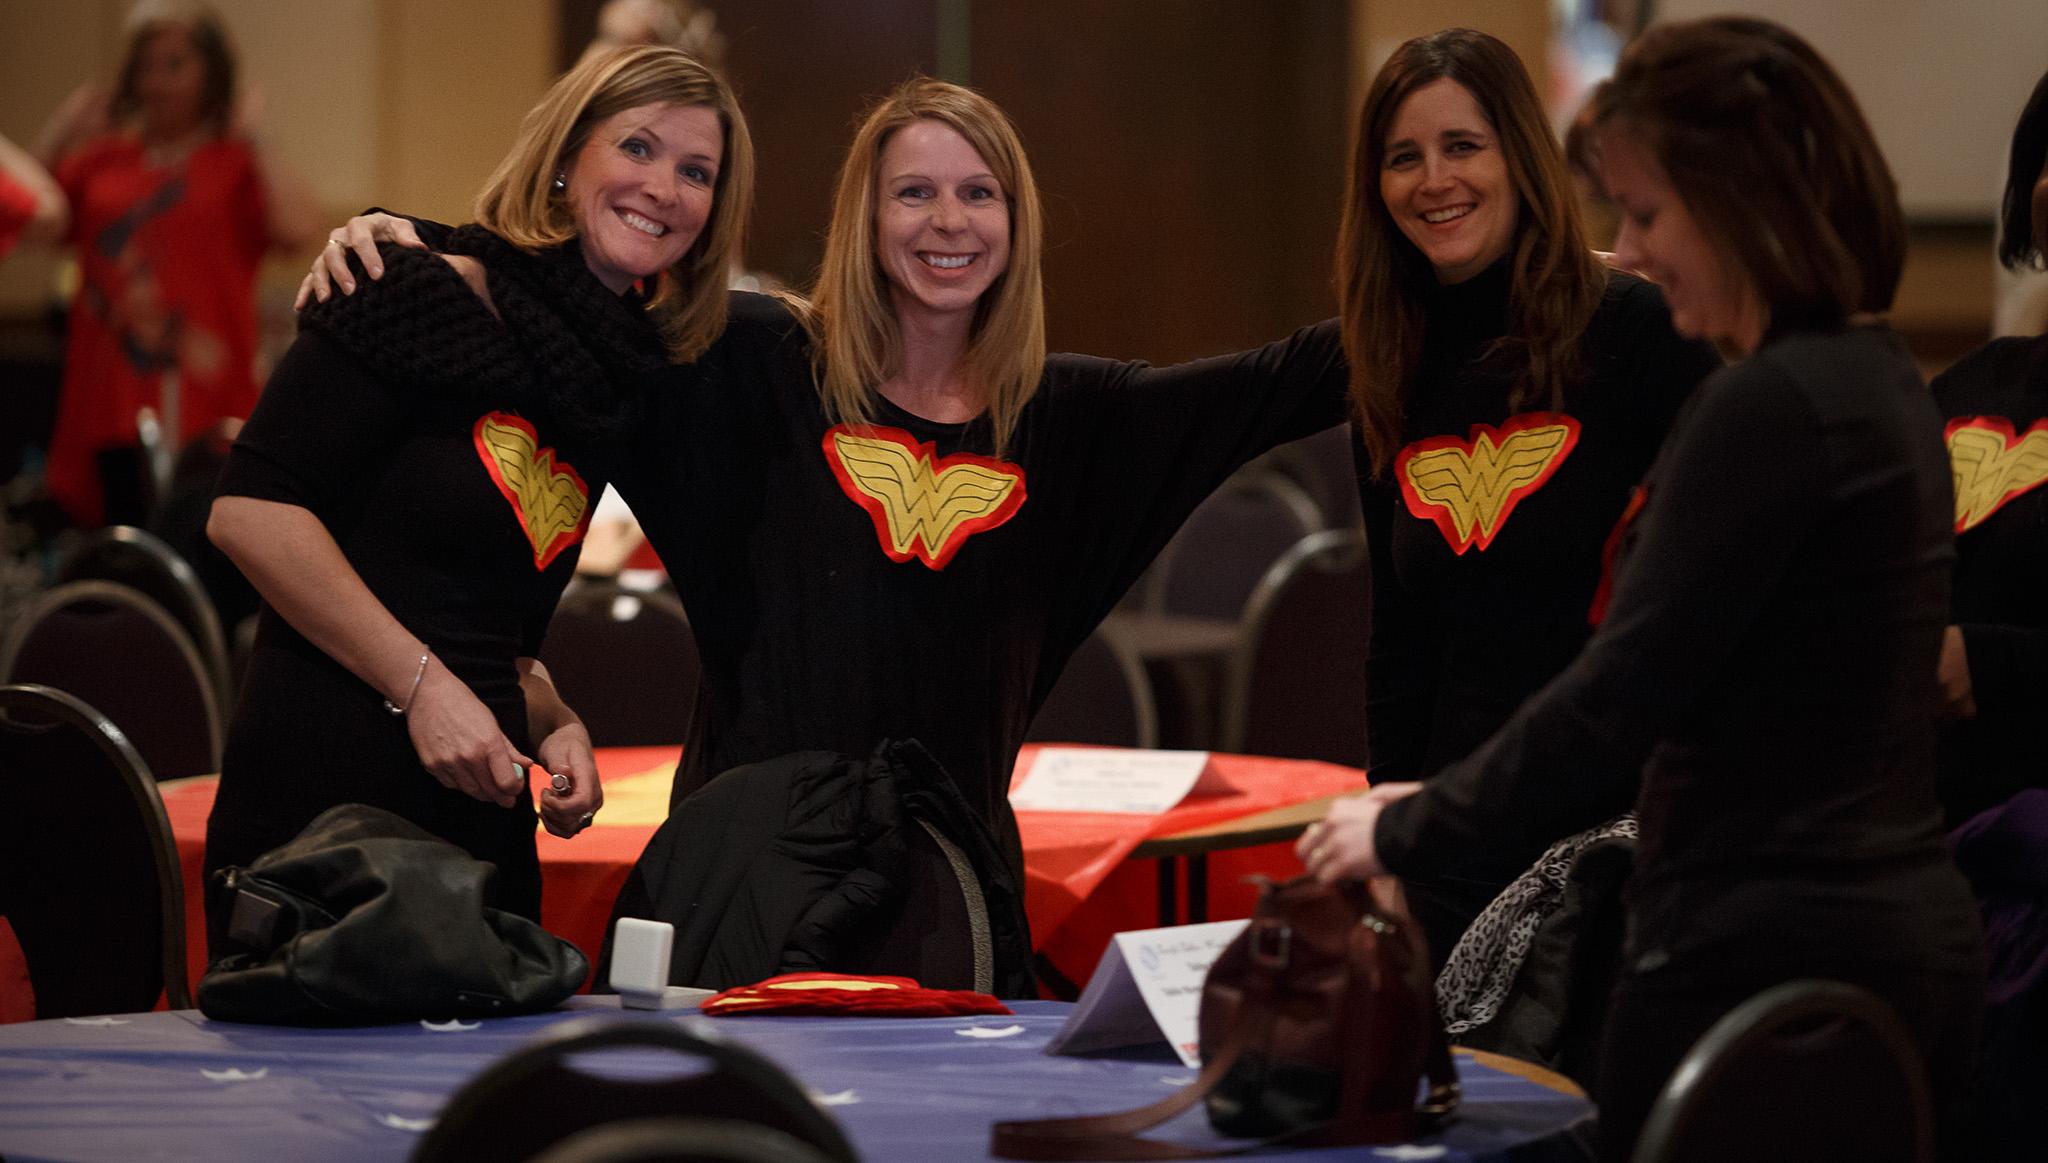 Terrific Tables, Wonderful Women